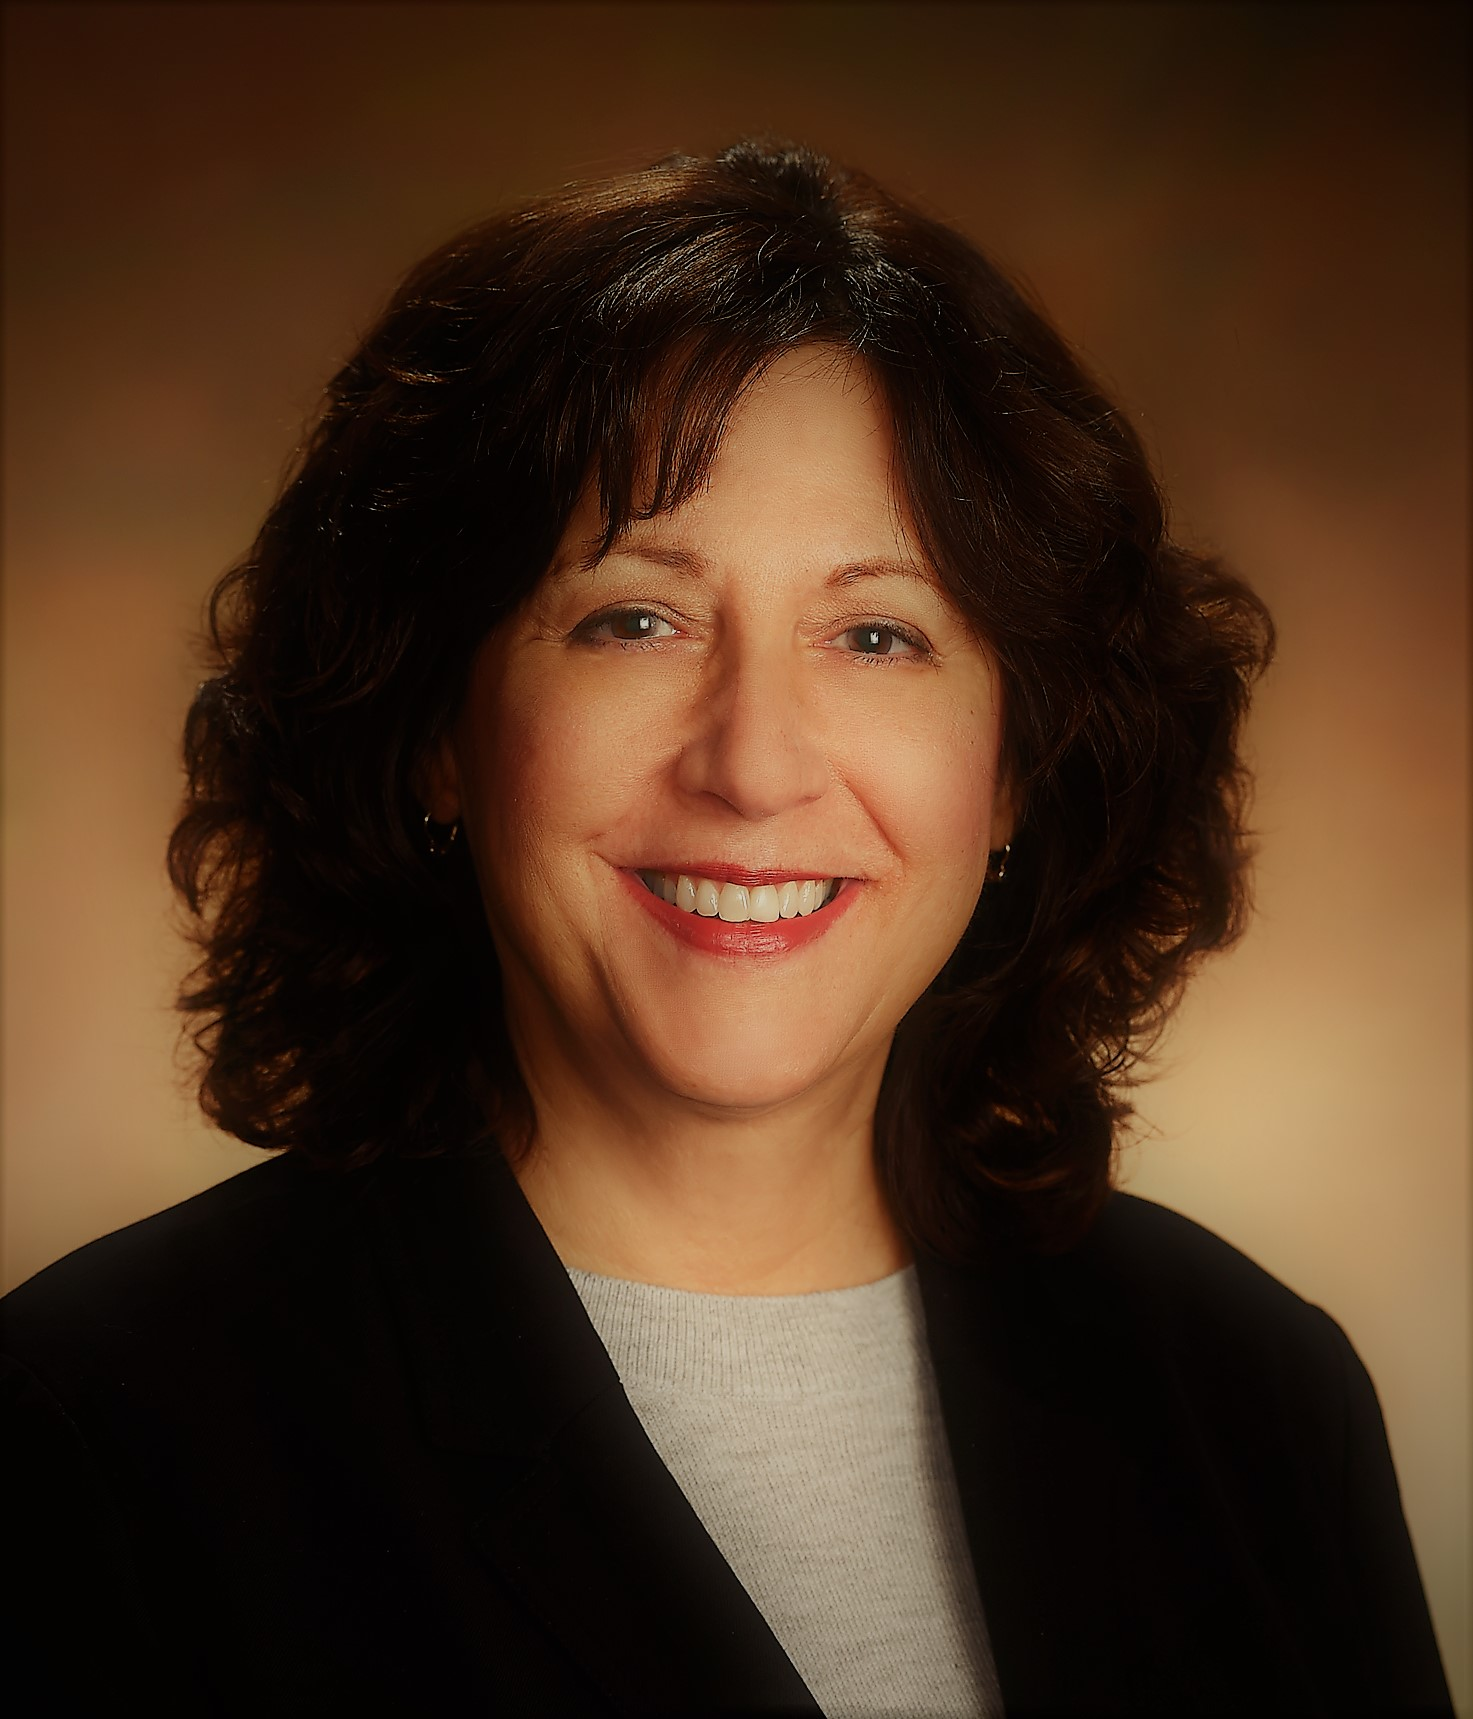 Deborah Wurtz